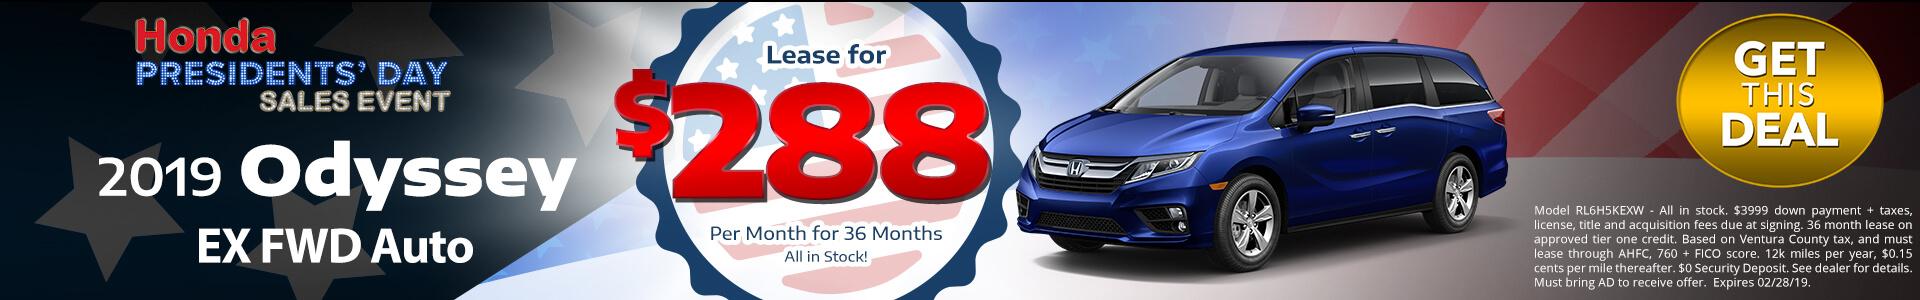 Honda Odyssey $288 Lease